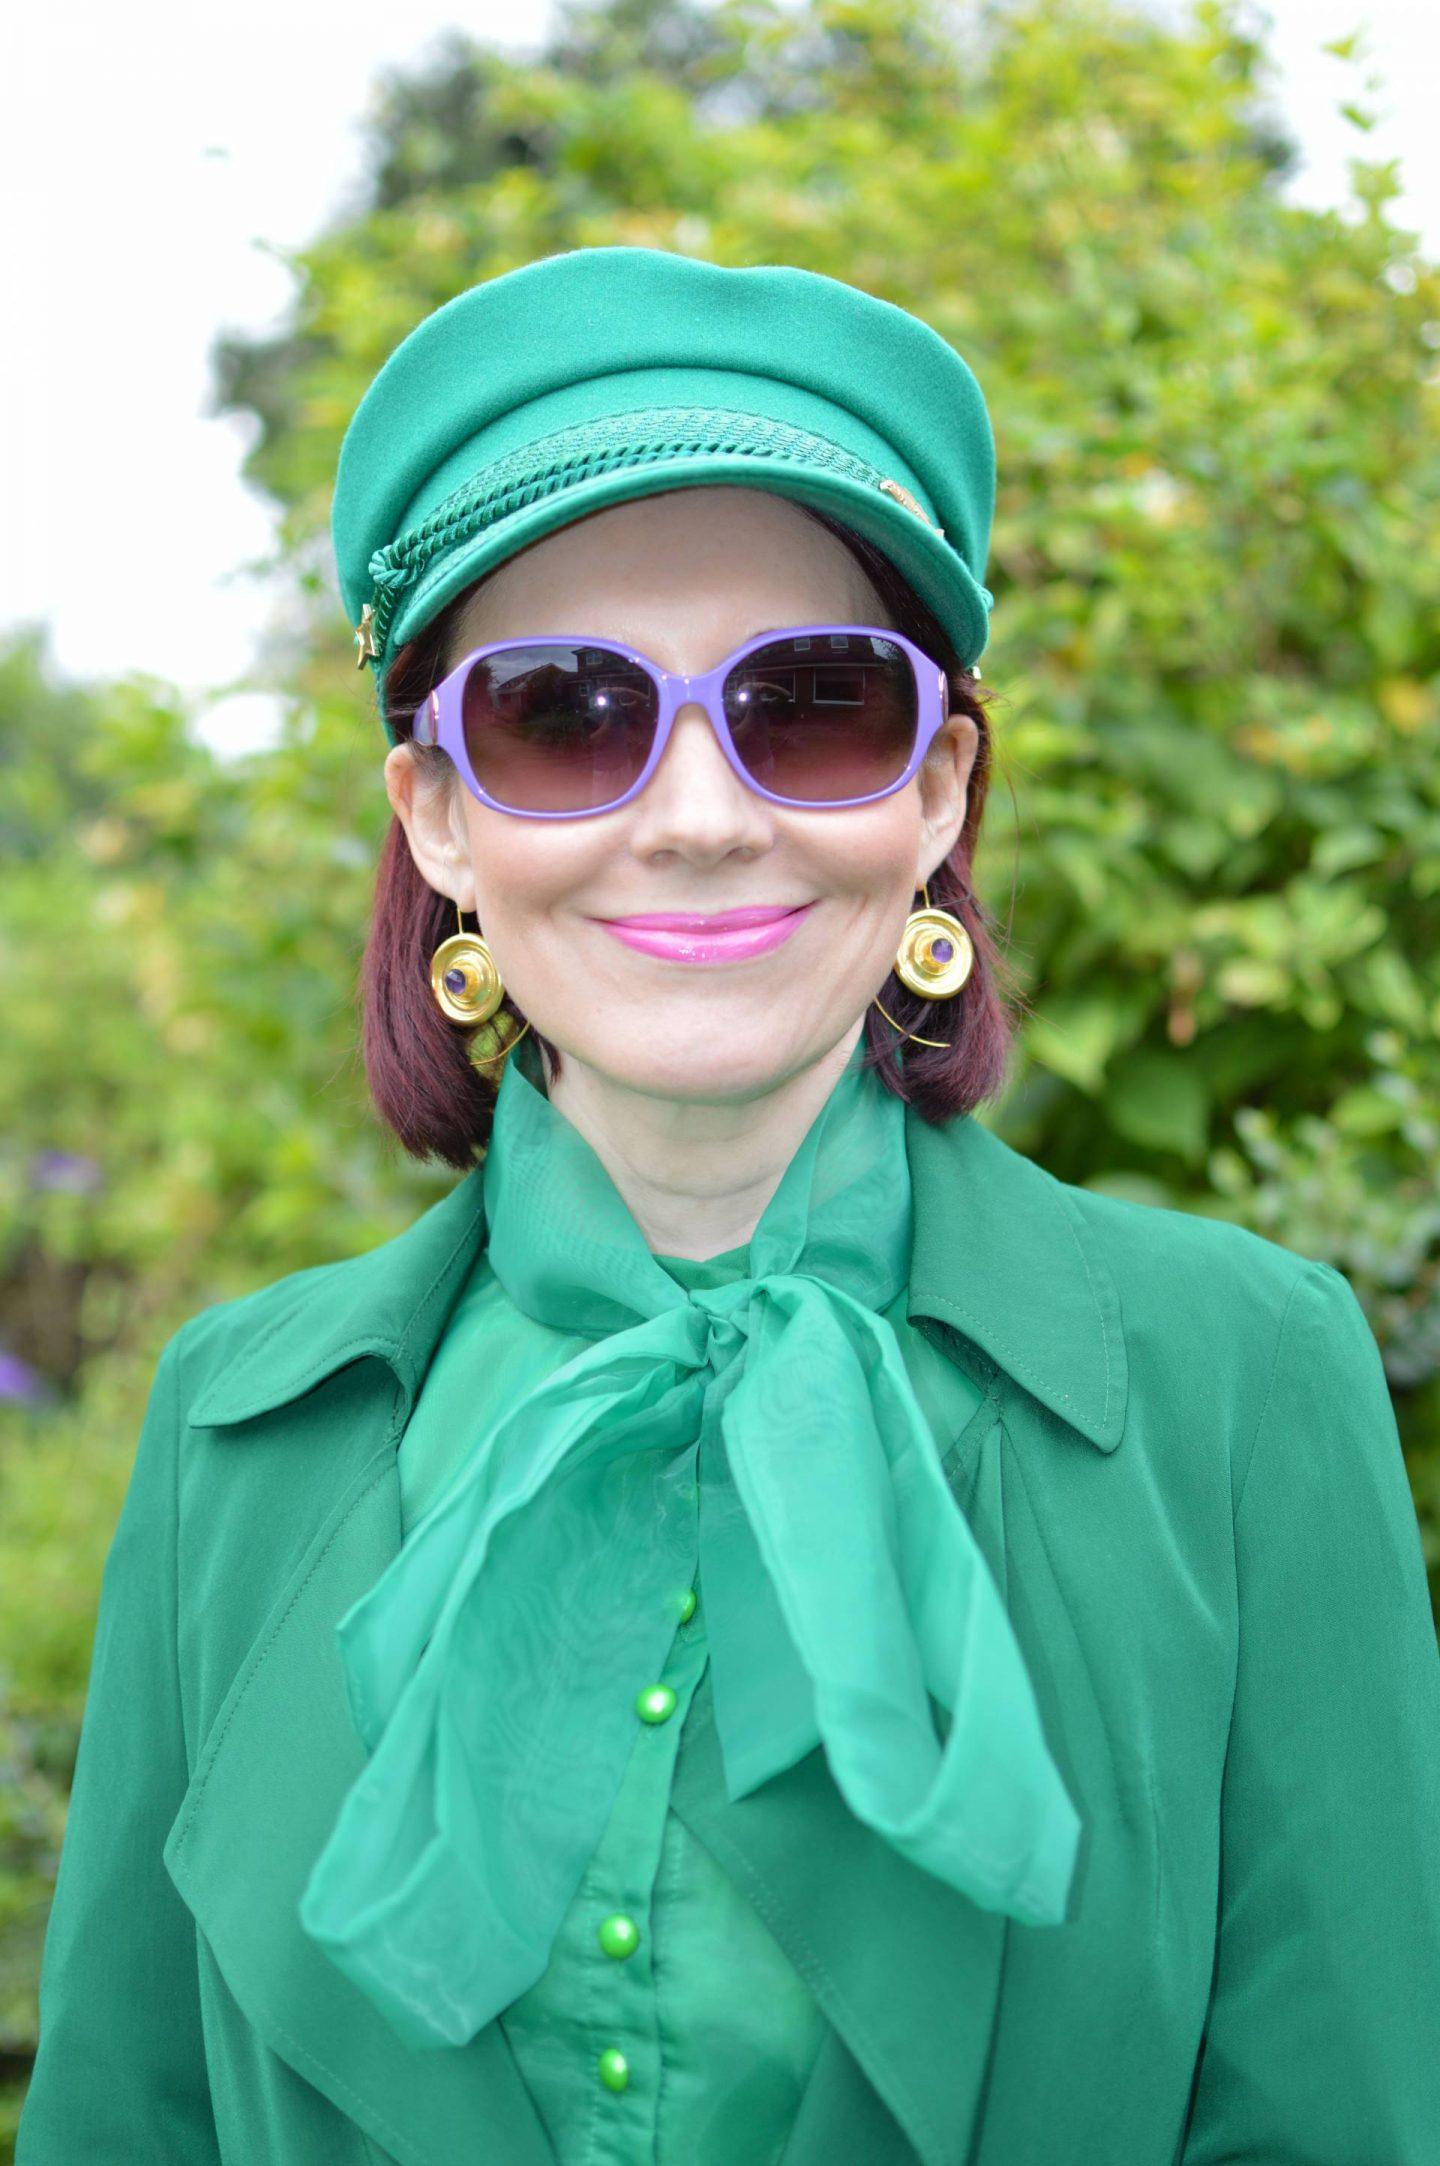 Green Organza Bow Blouse, Fabienne Chapot green hat